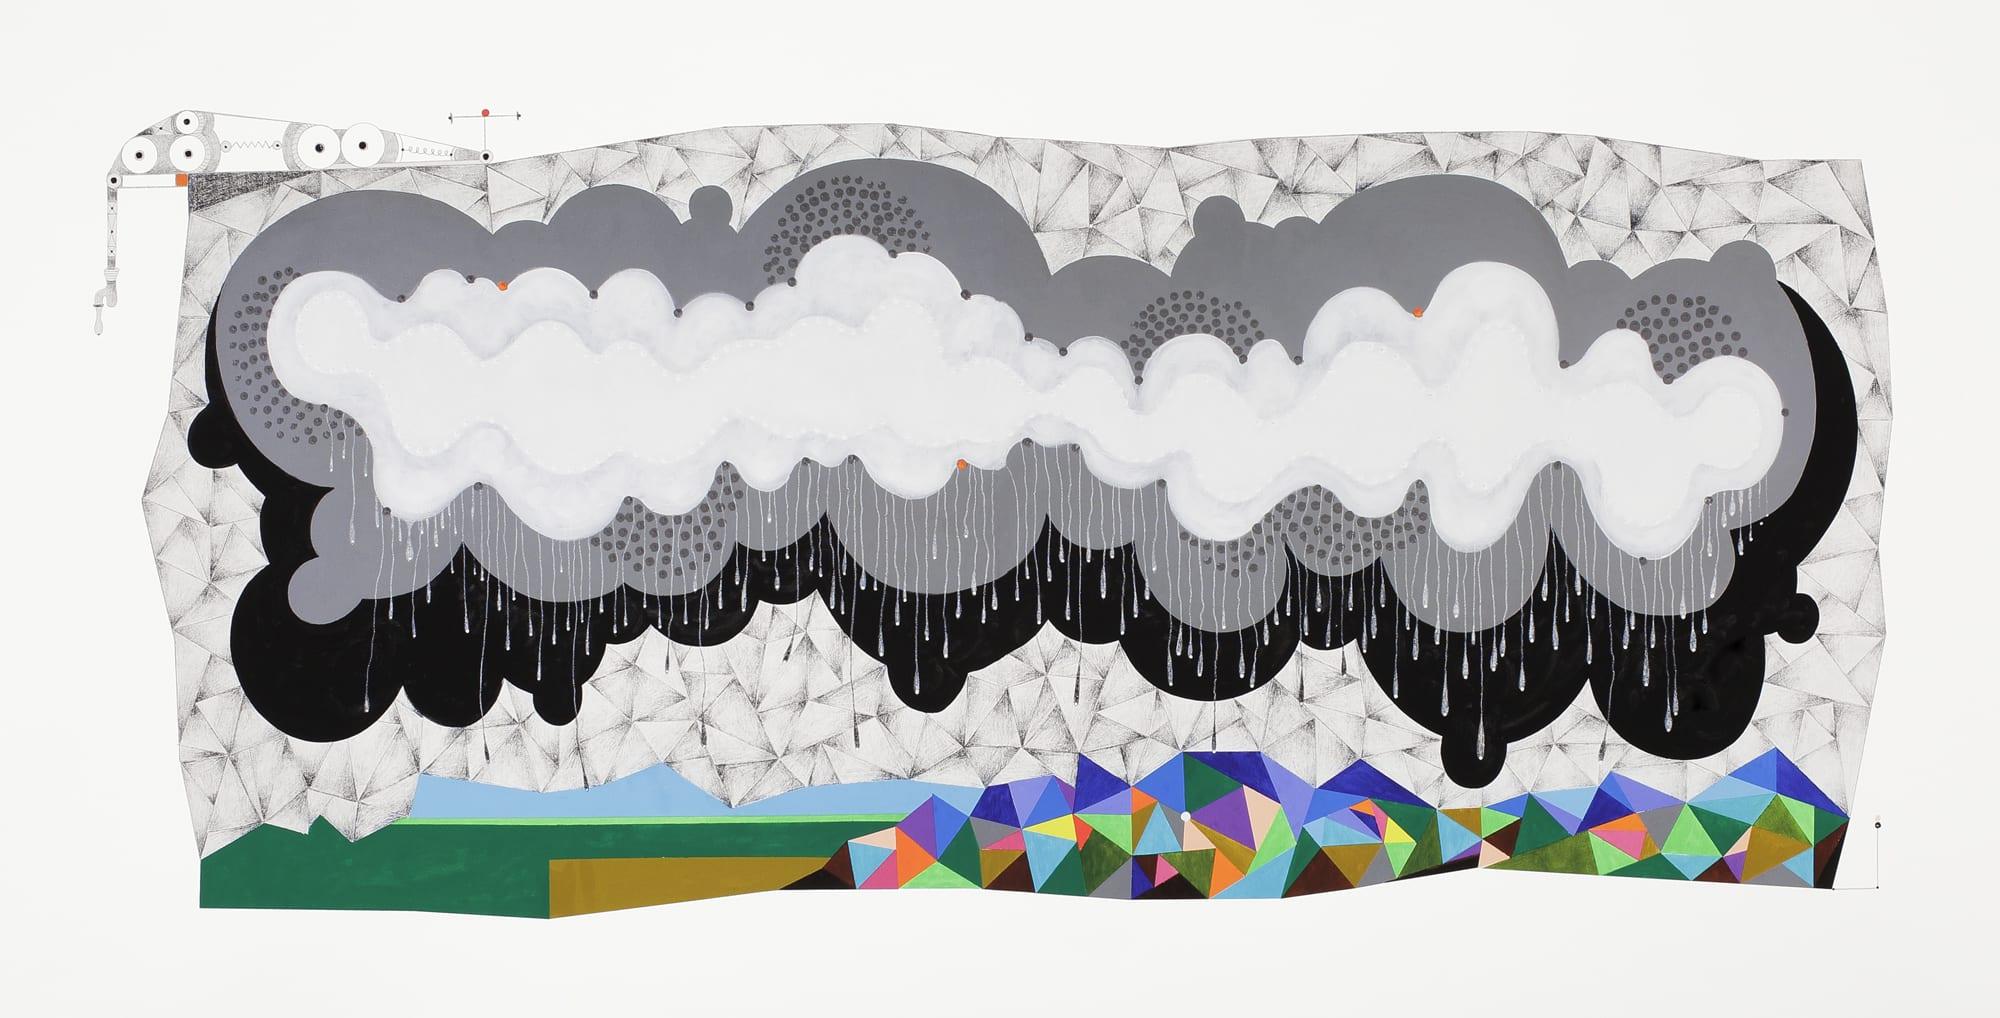 Cloud Pigment Print by Luis Cruz-Azaceta